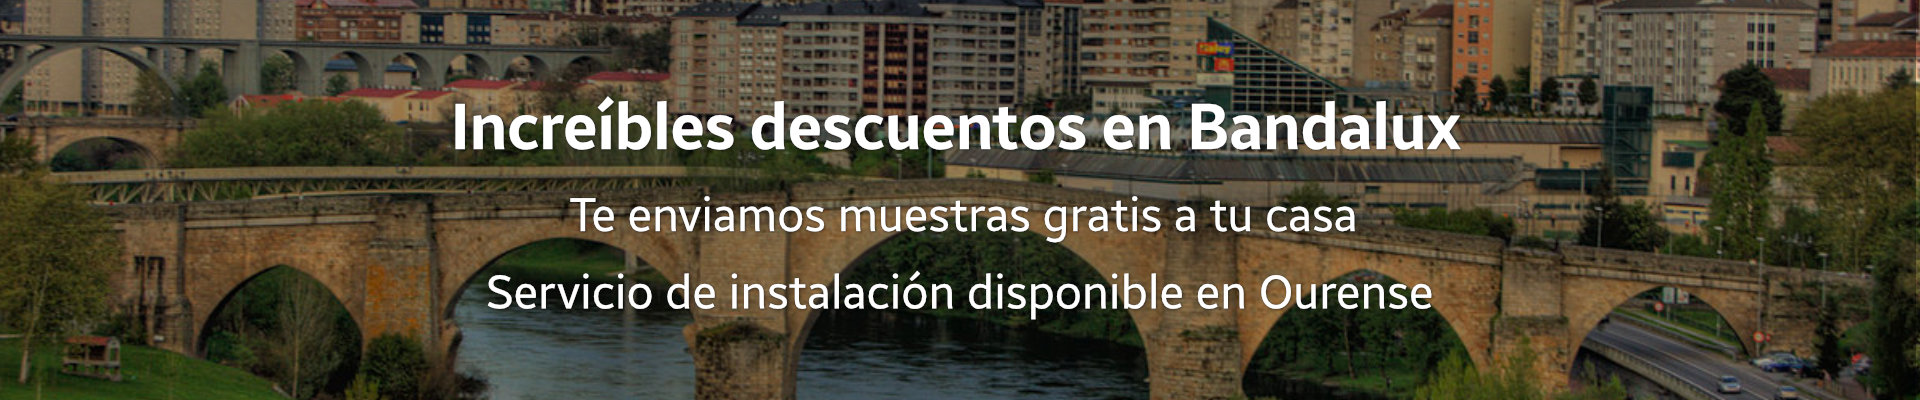 Grandes descuentos en Bandalux para Ourense